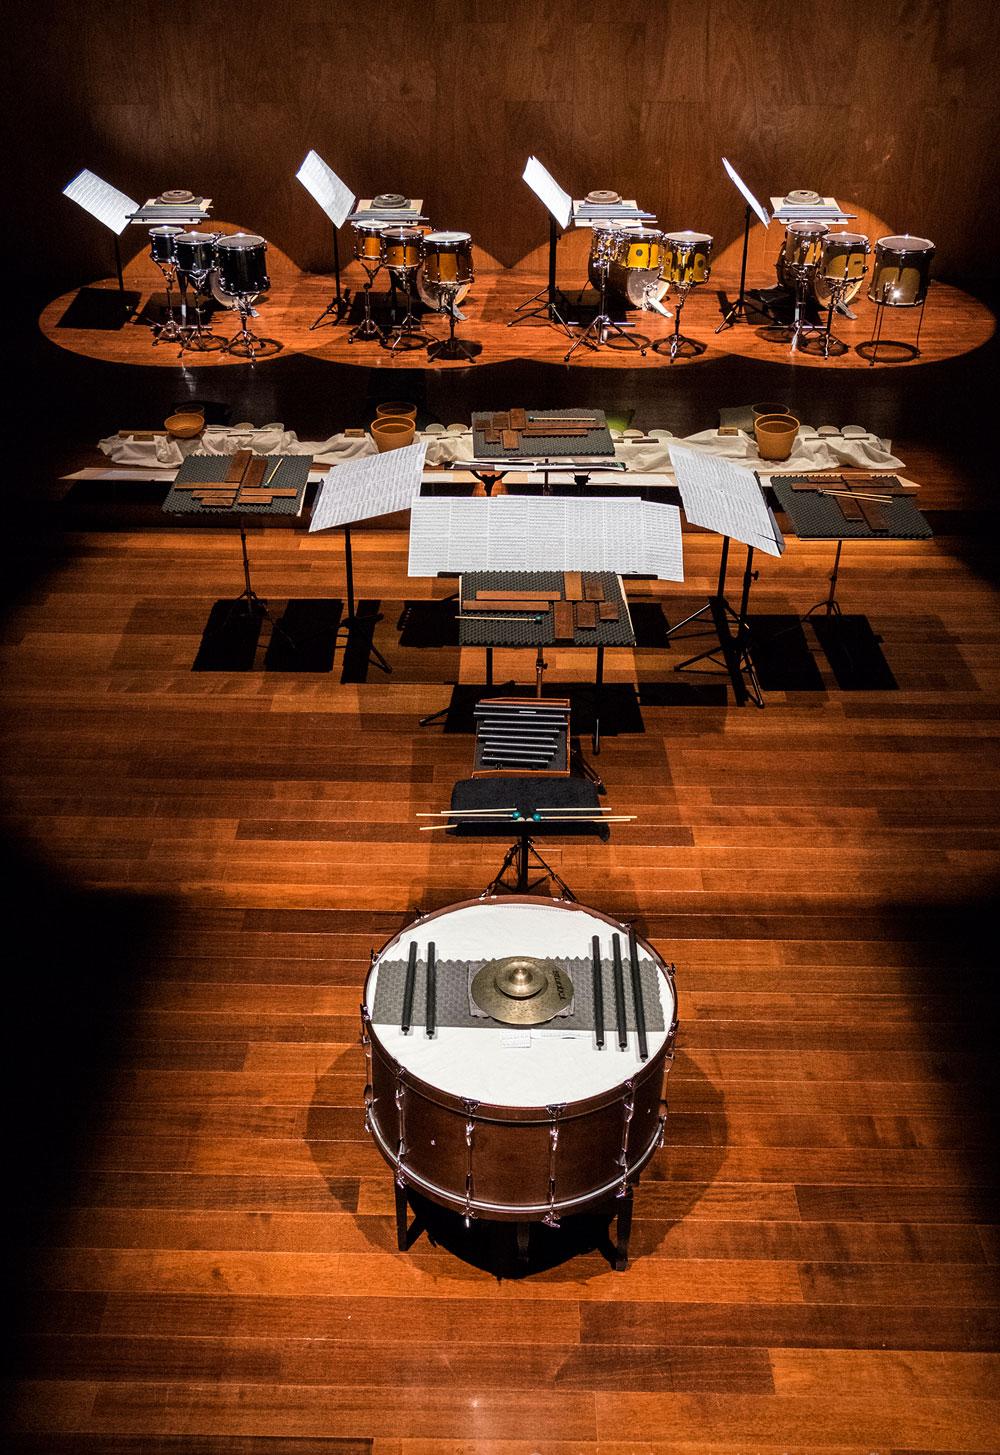 Frames Percussion © Miquel Àngel Vich